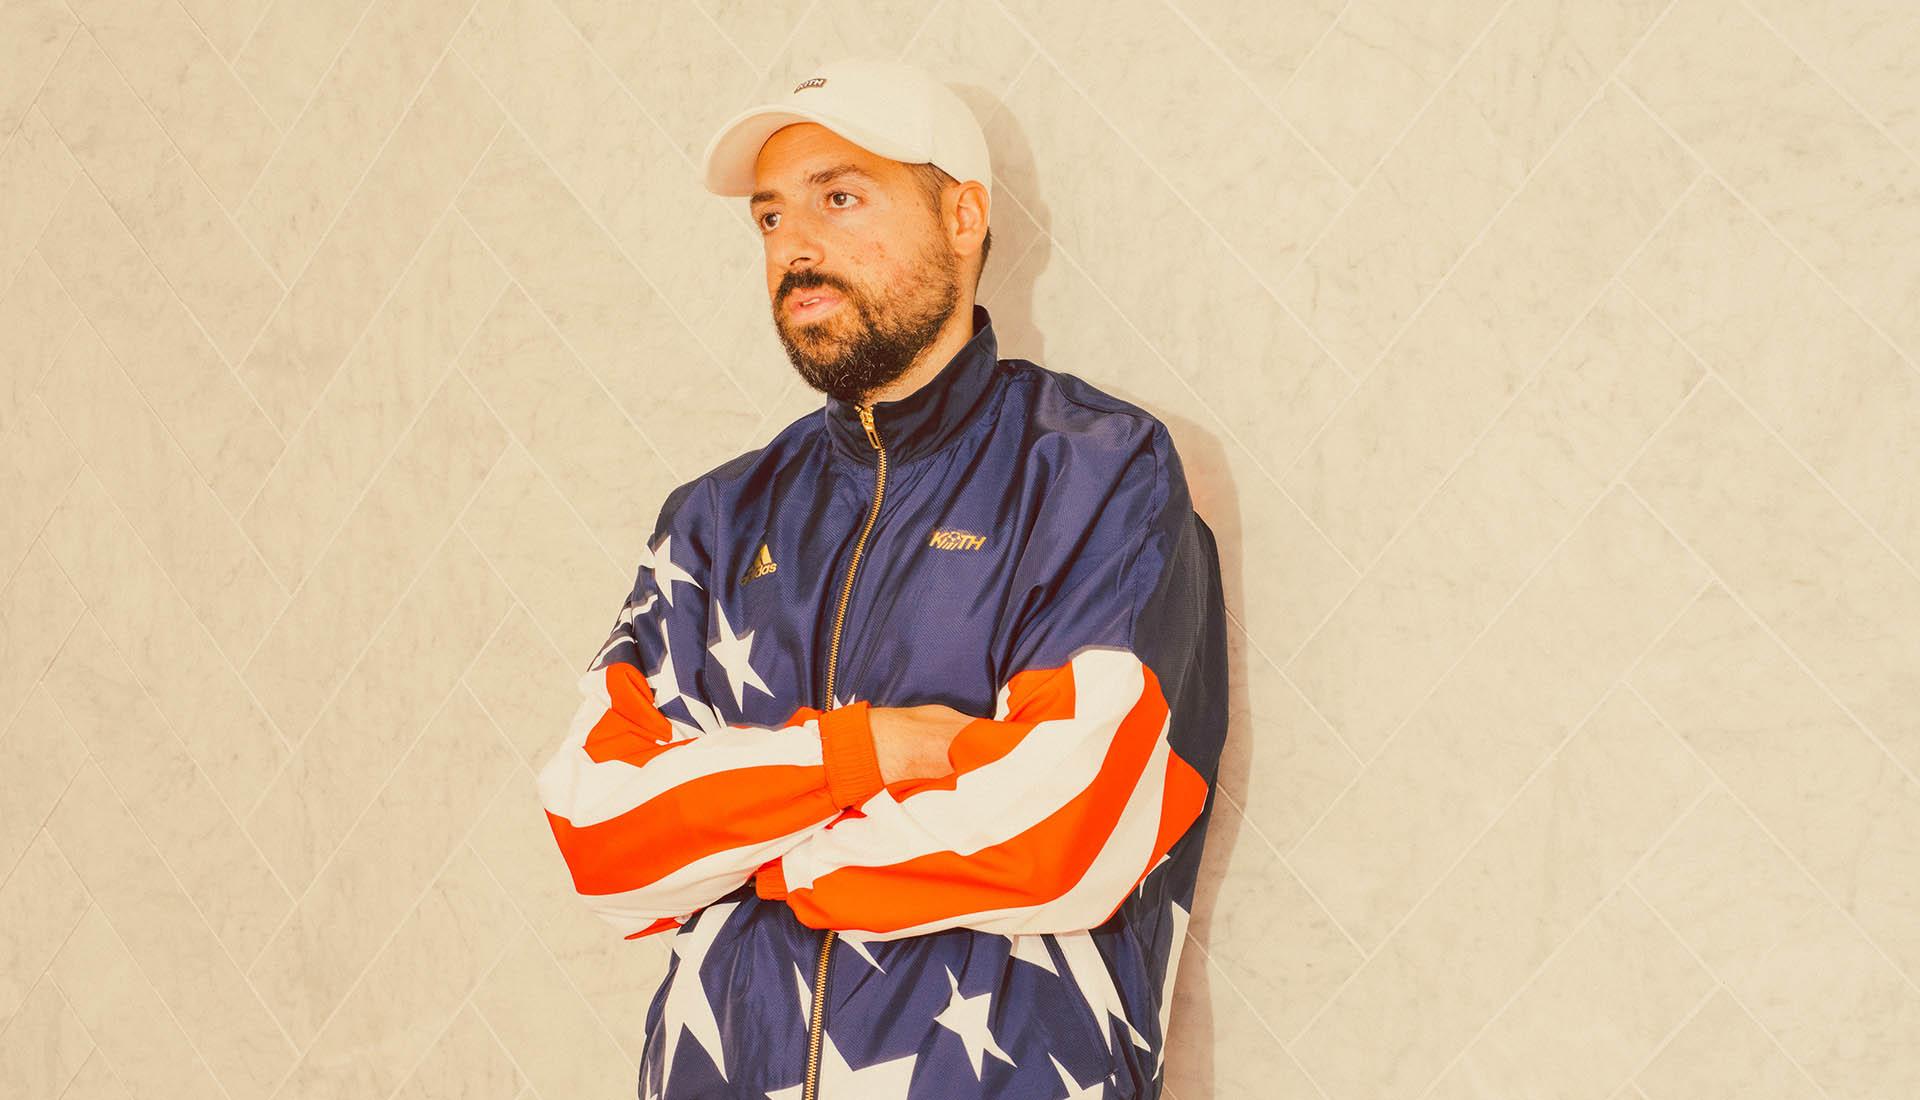 KITH's Ronnie Fieg Talks Soccer & Fashion SoccerBible